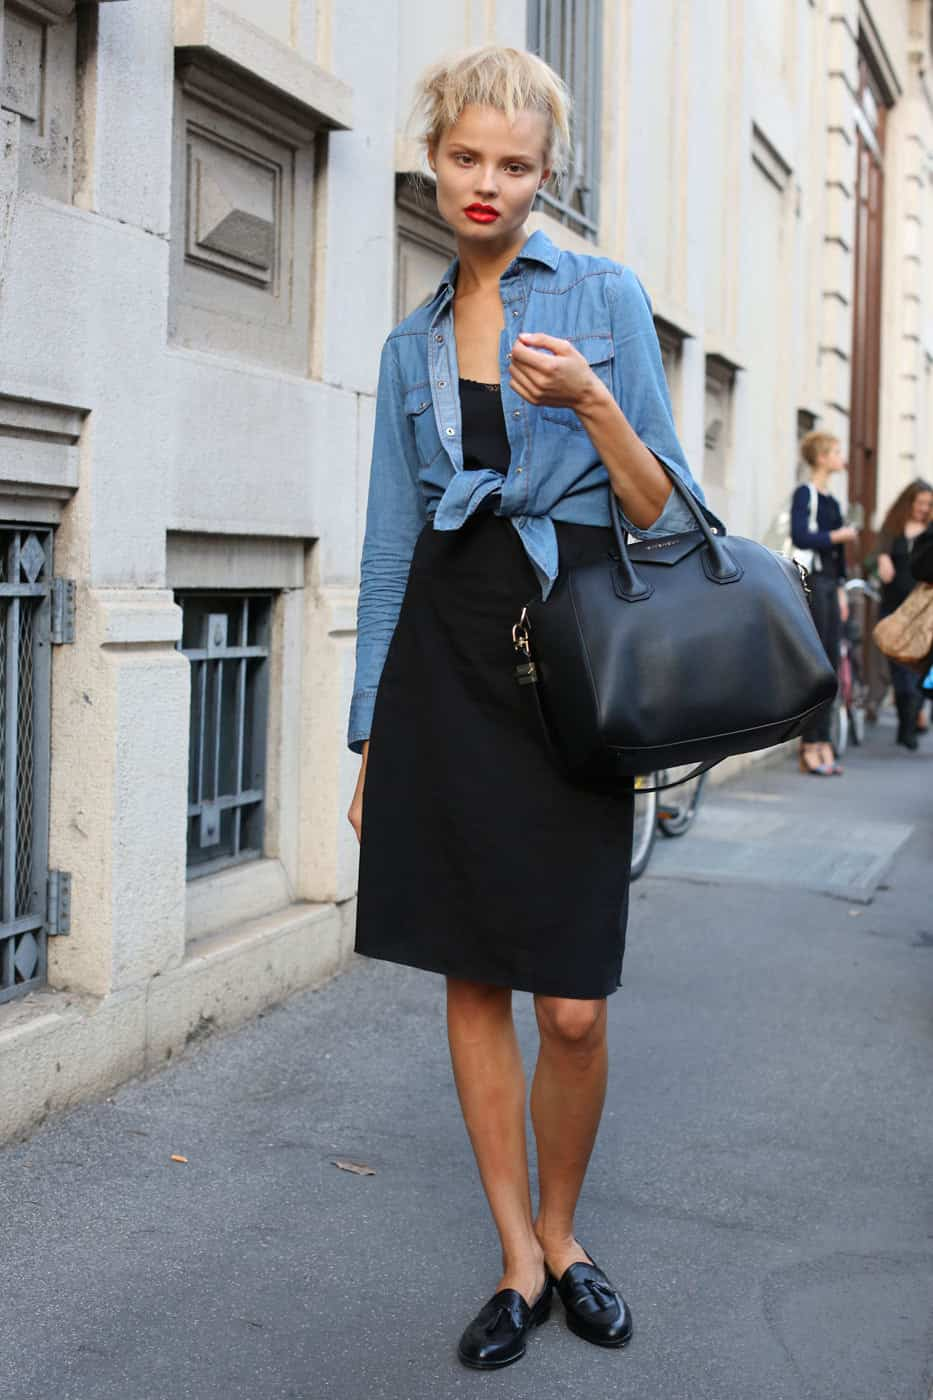 street-style-denim-shirt (2)